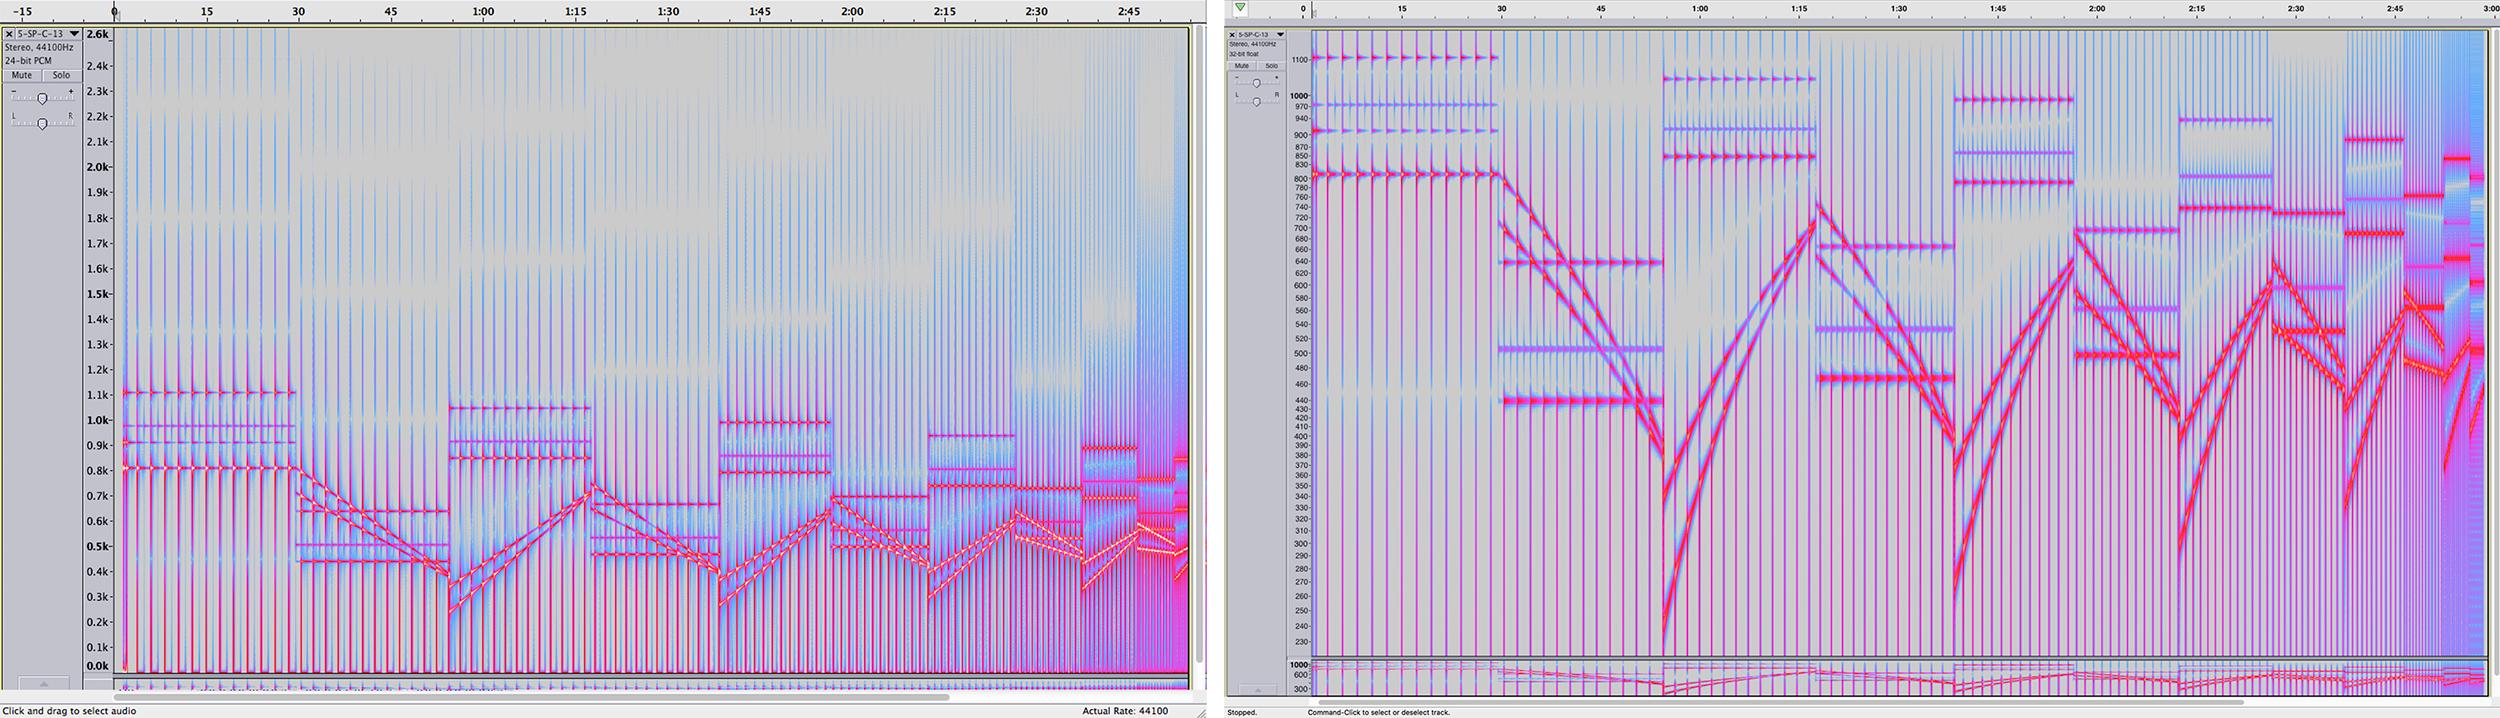 Spectrogram of *SP/C/13* in Audacity.